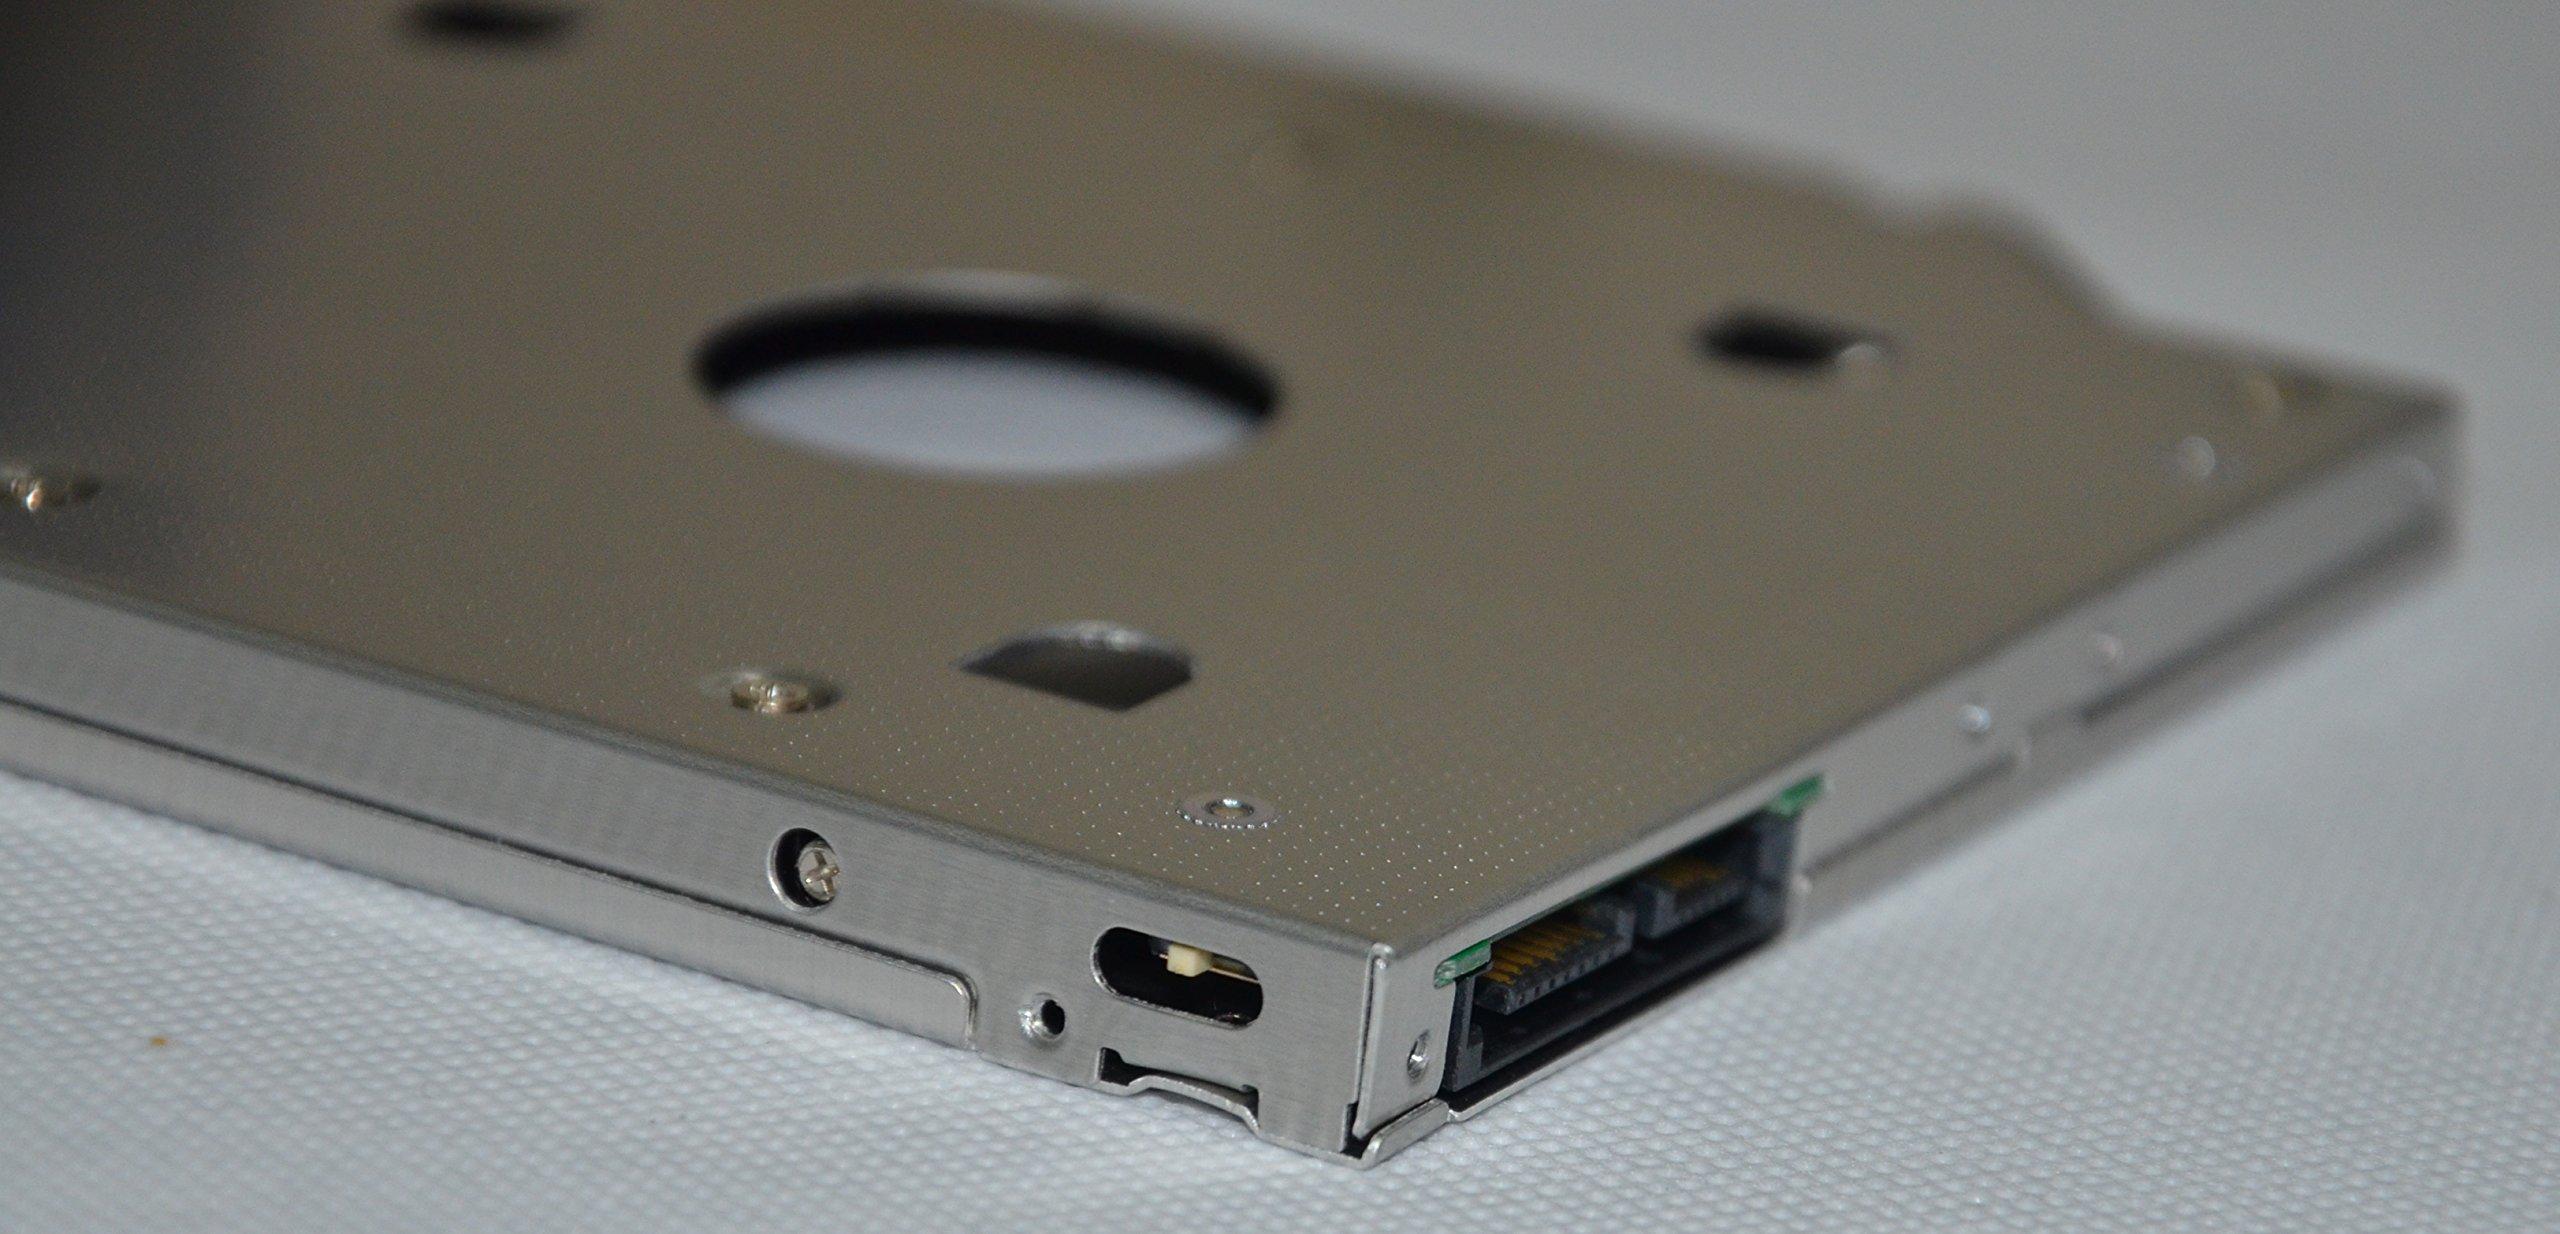 Deyoung 2nd HDD SSD Caddy Adapter for Dell Latitude E6420 E6520 E6320 E6430 E6530 E6330 by De Young (Image #3)